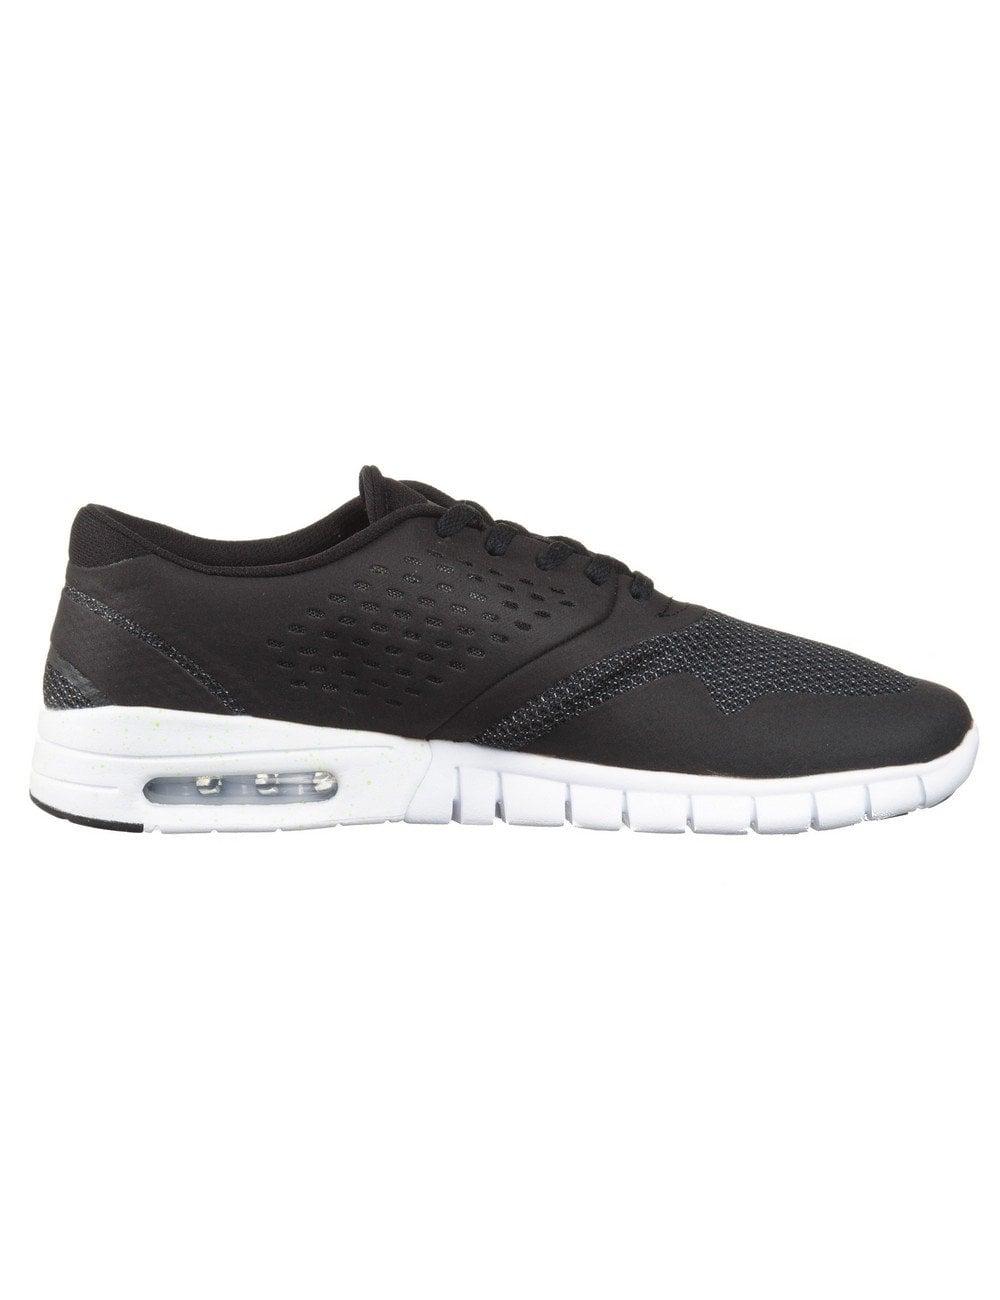 sports shoes 2f17e 5dcce Eric Koston 2 Max Shoes - BlackFlash Lemon